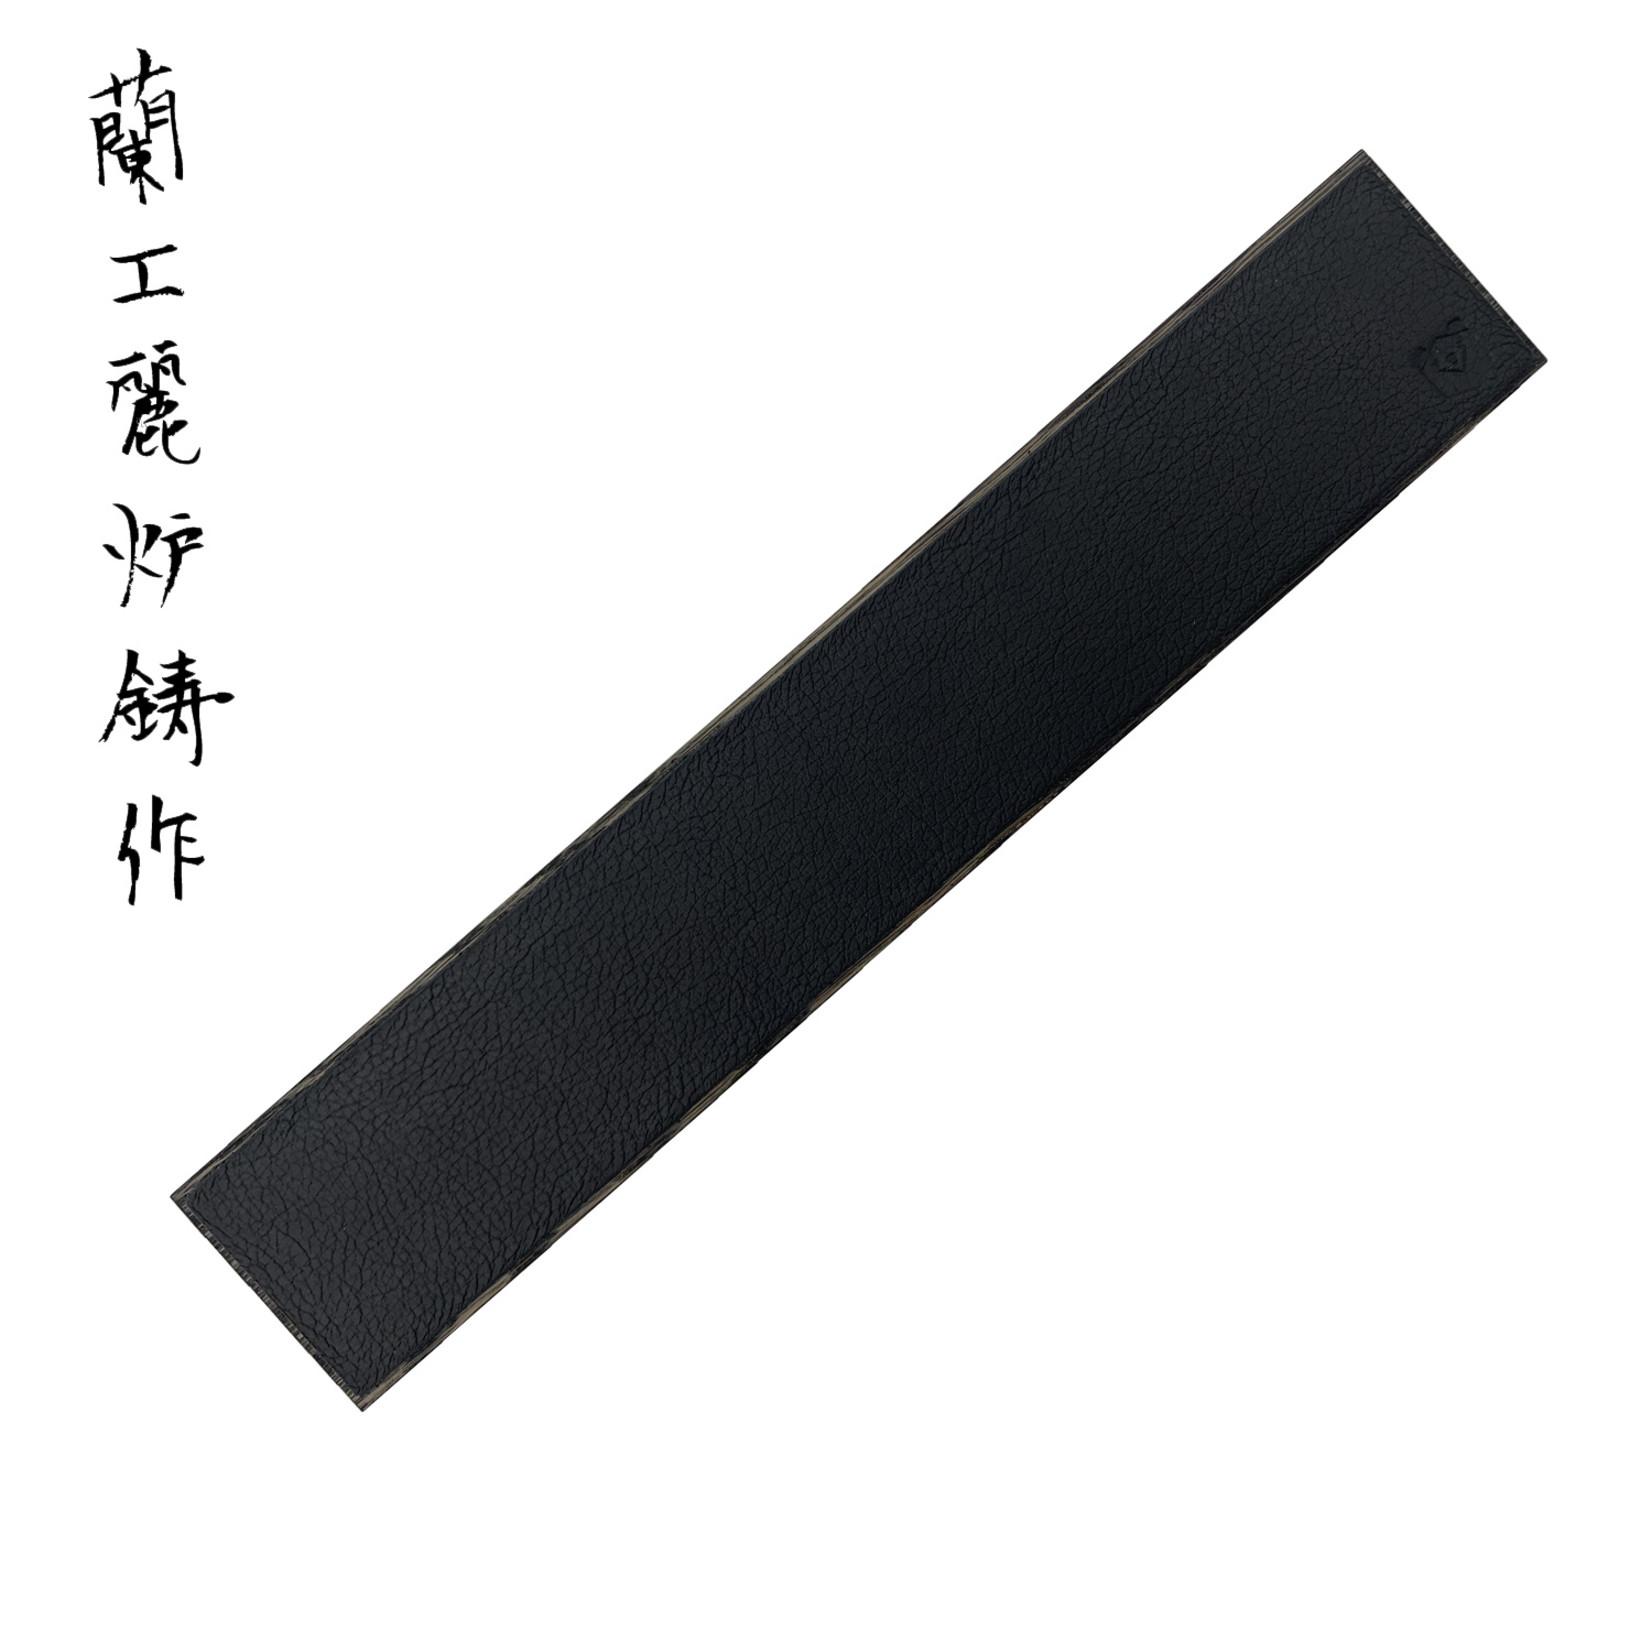 PIOTR THE BEAR knifemagnet leather 300 mm black